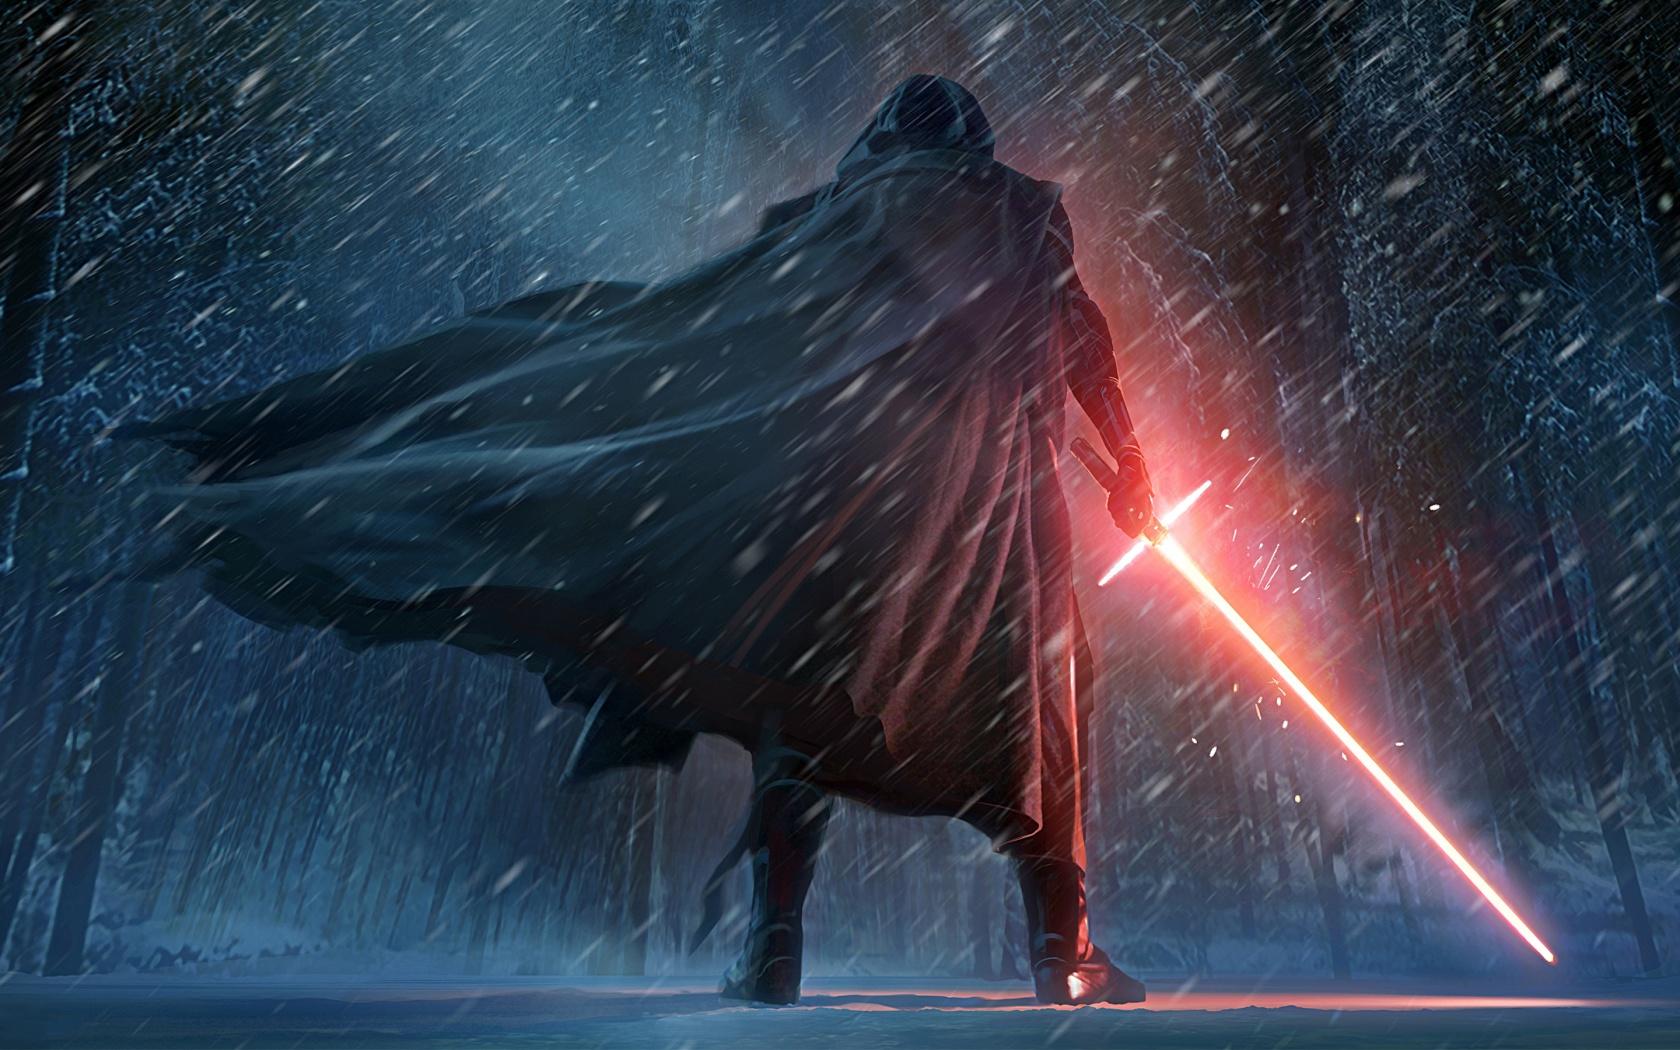 Kylo Ren Star Wars The Force Awakens Artwork 1680x1050